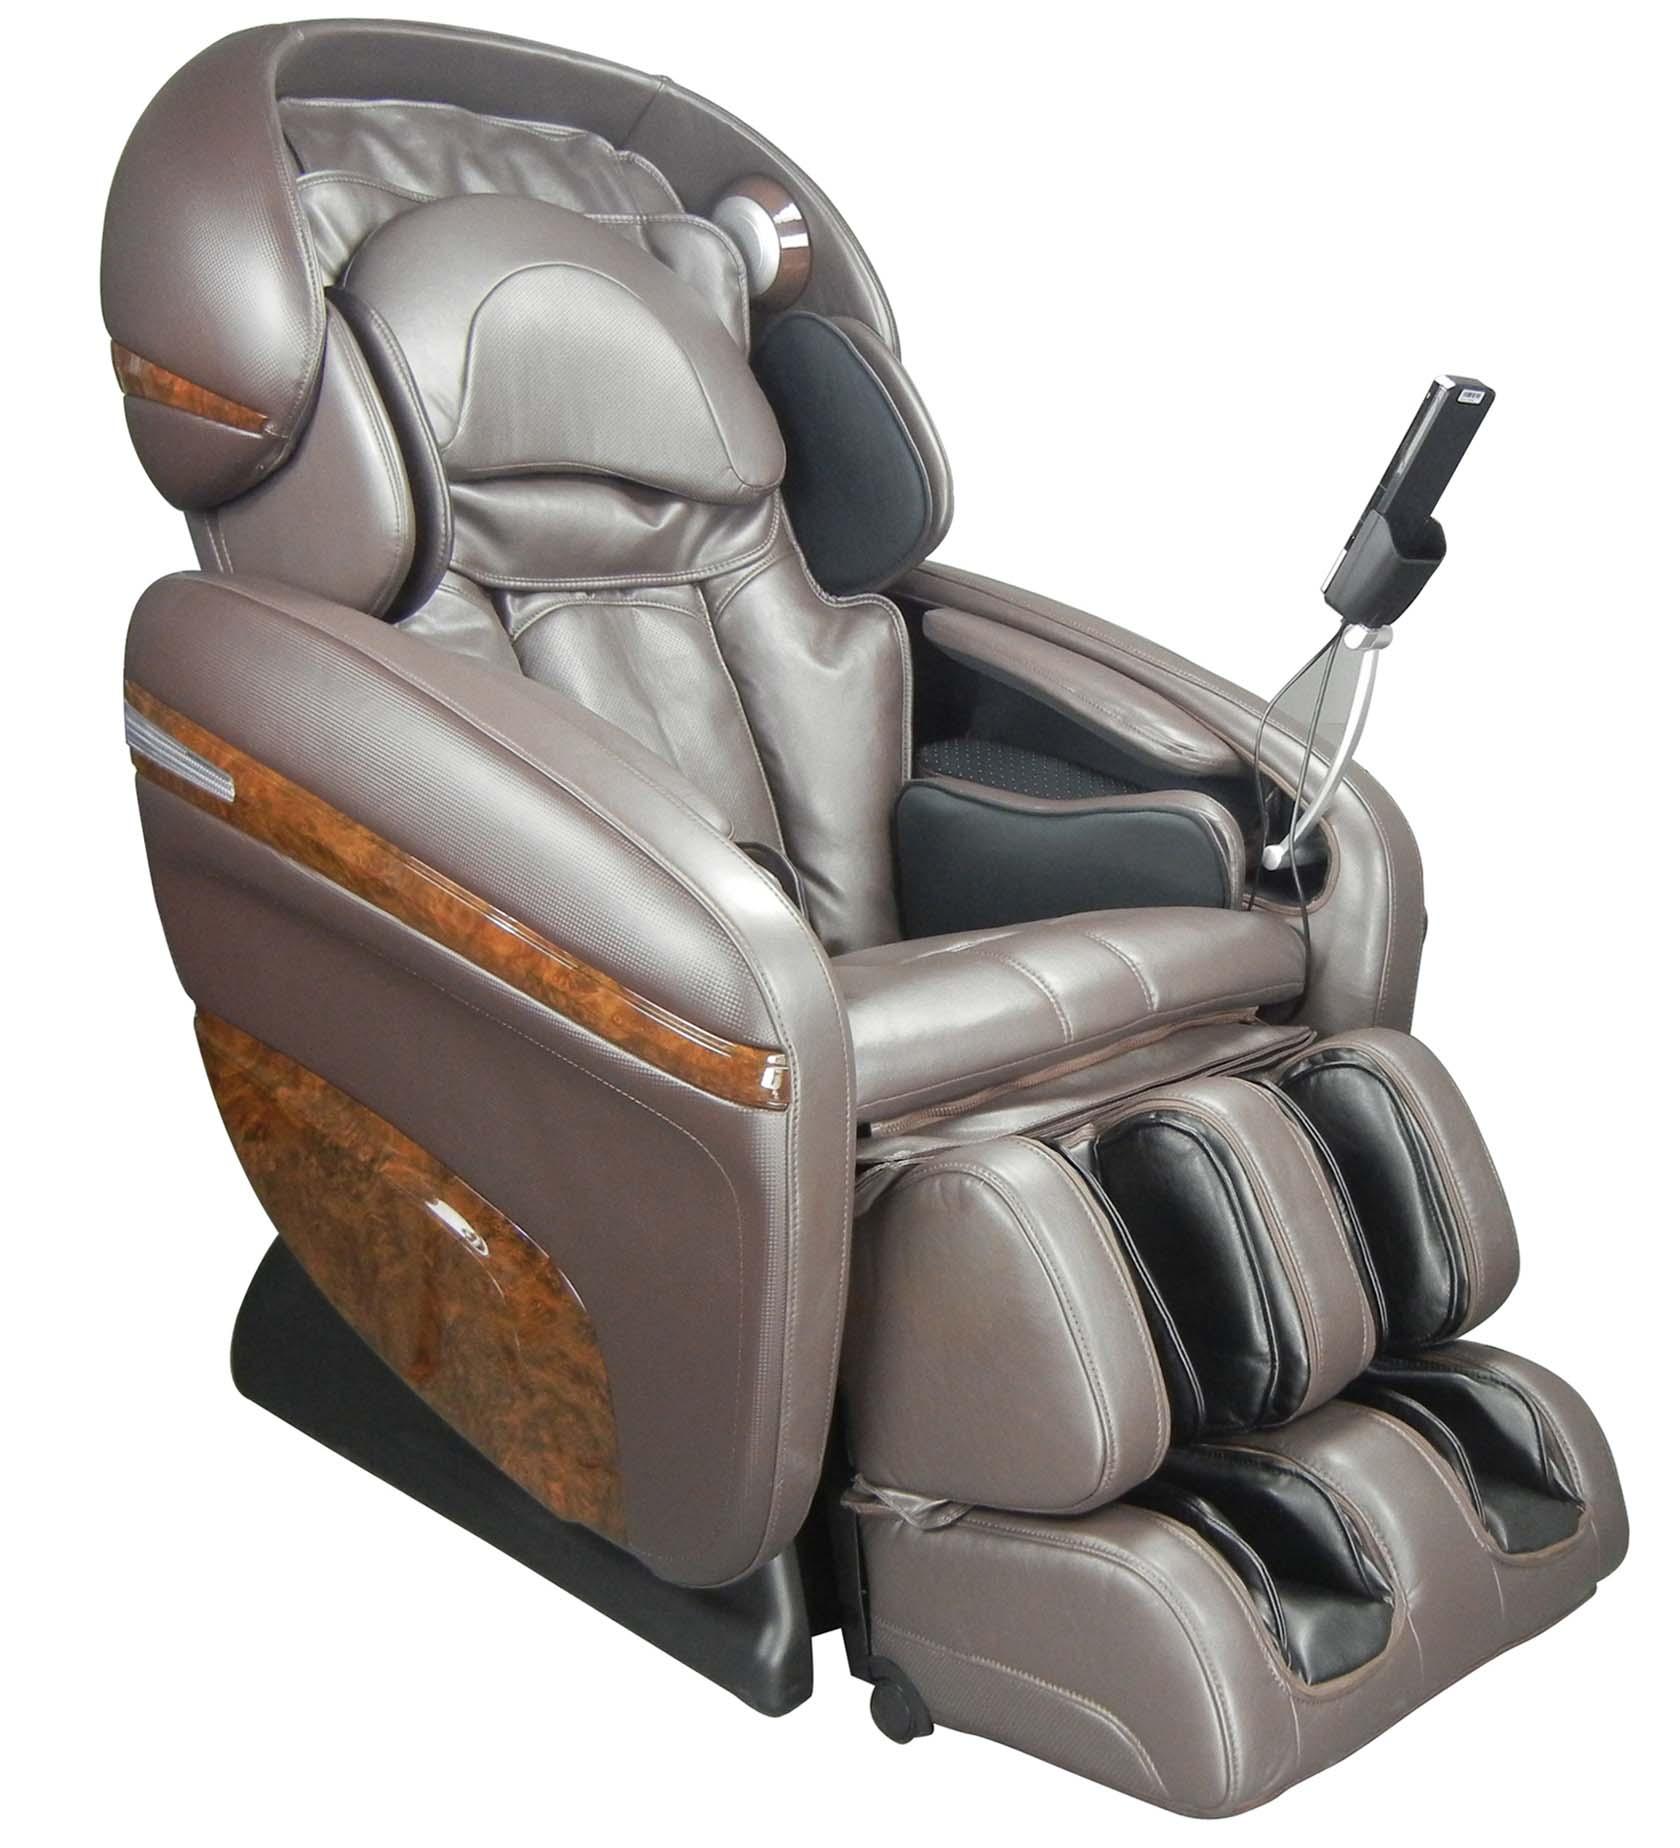 osaki os 3d cyber pro massage chair mode dreamer zero gravity recliner